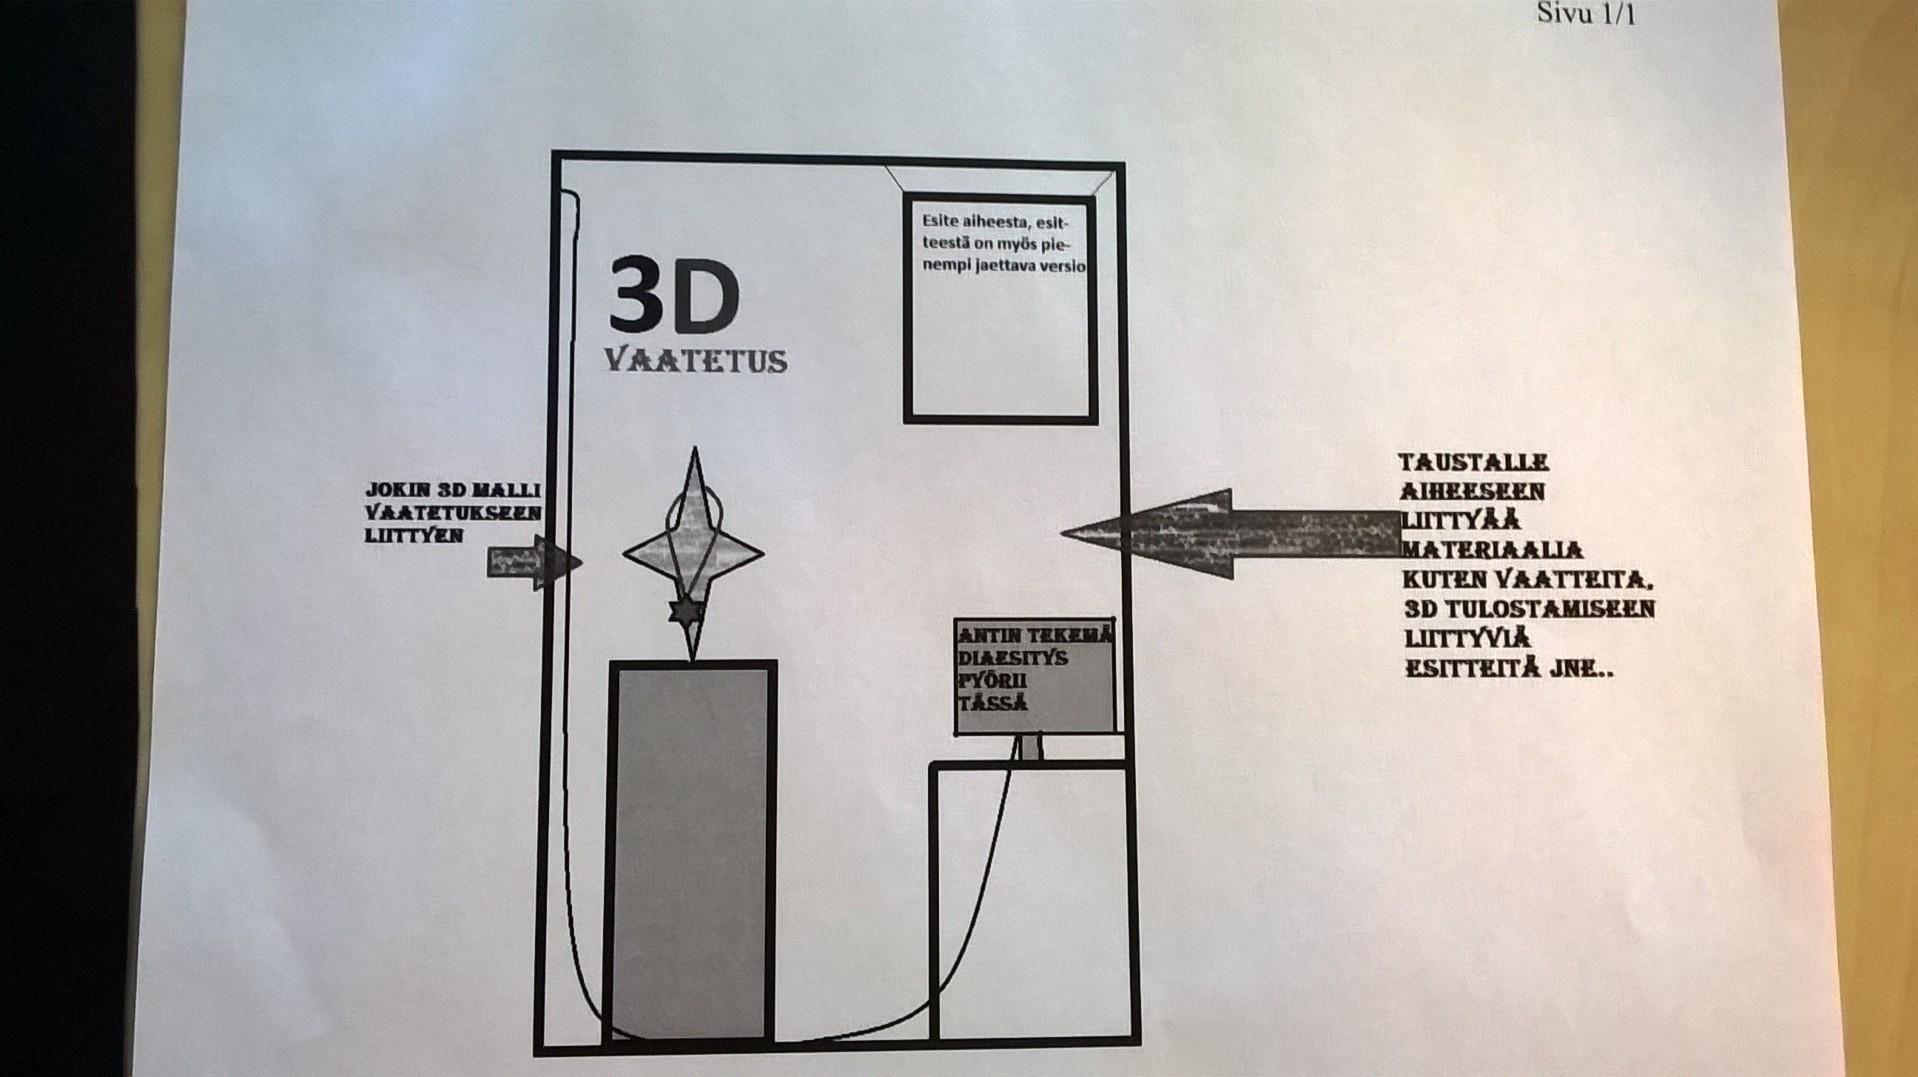 Suku puoli sarja kuvia 3D